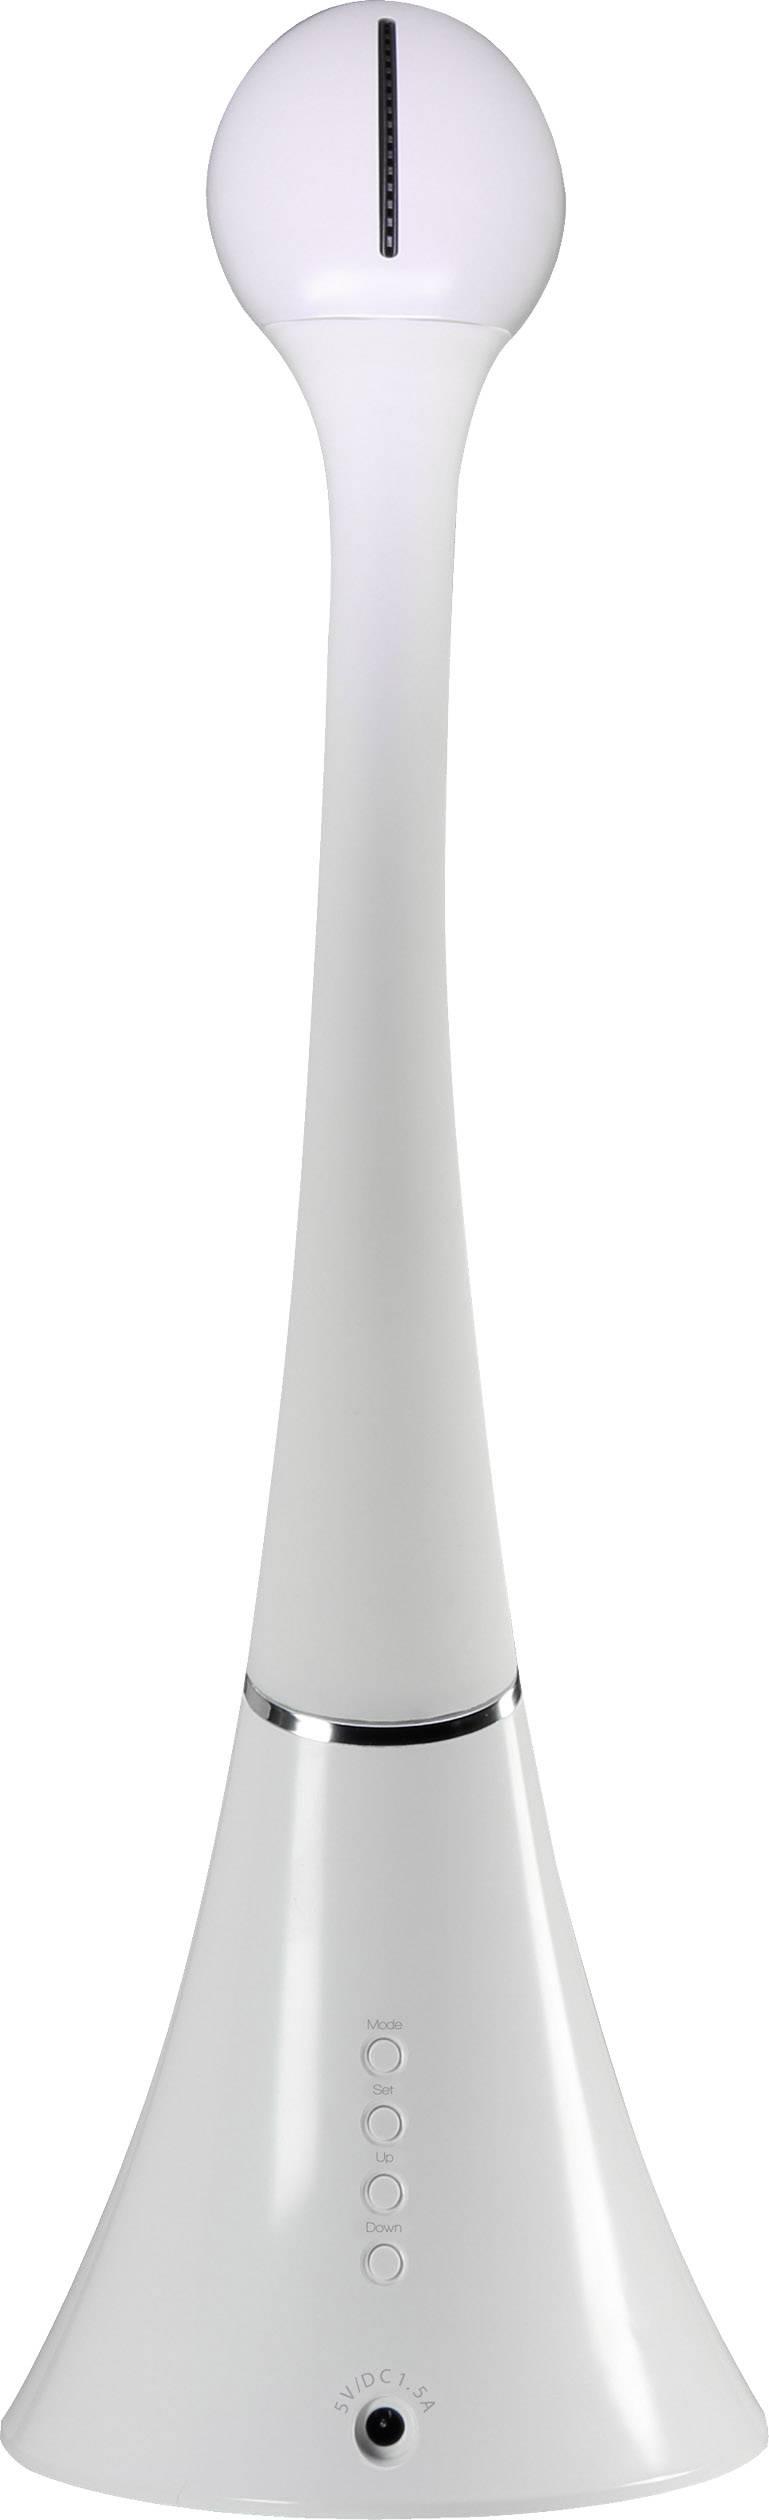 JourFroid Bureau 10 De ChaudLumière Du Lampe W EecaEBlanc Led Polarlite kXn8w0PO